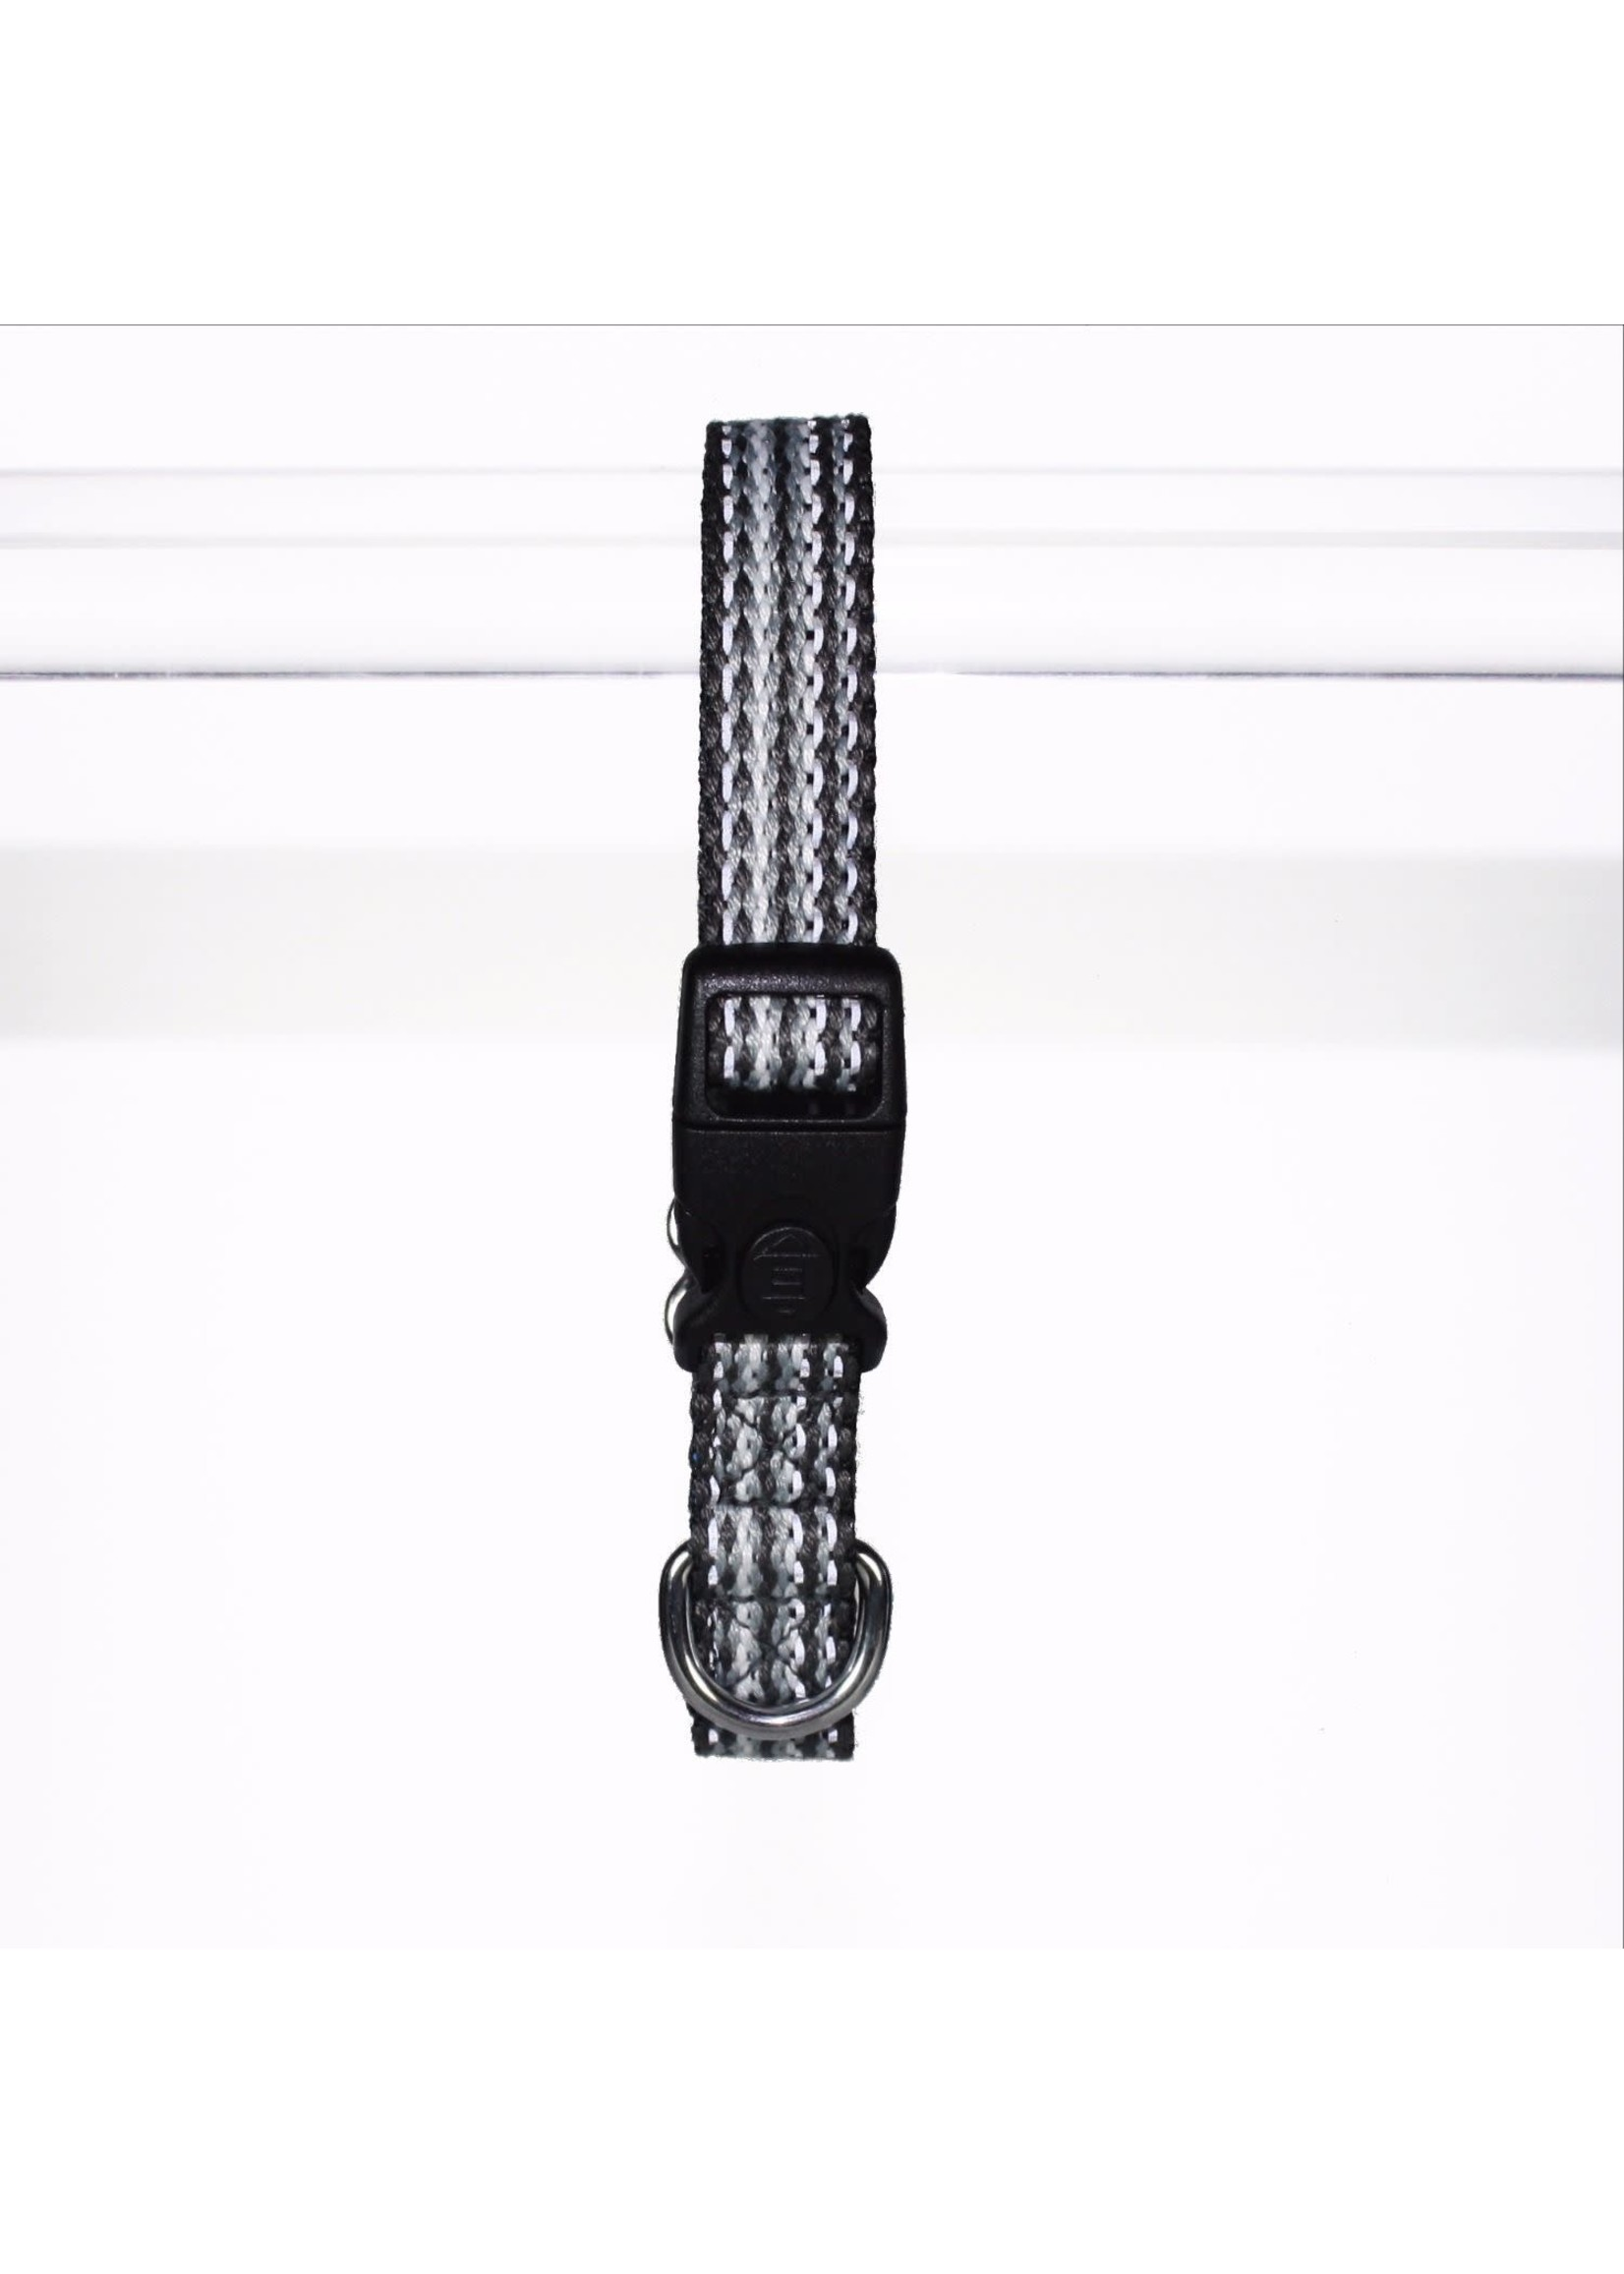 Goli Design Goli Haight Ashbury Reflective Dog Collar